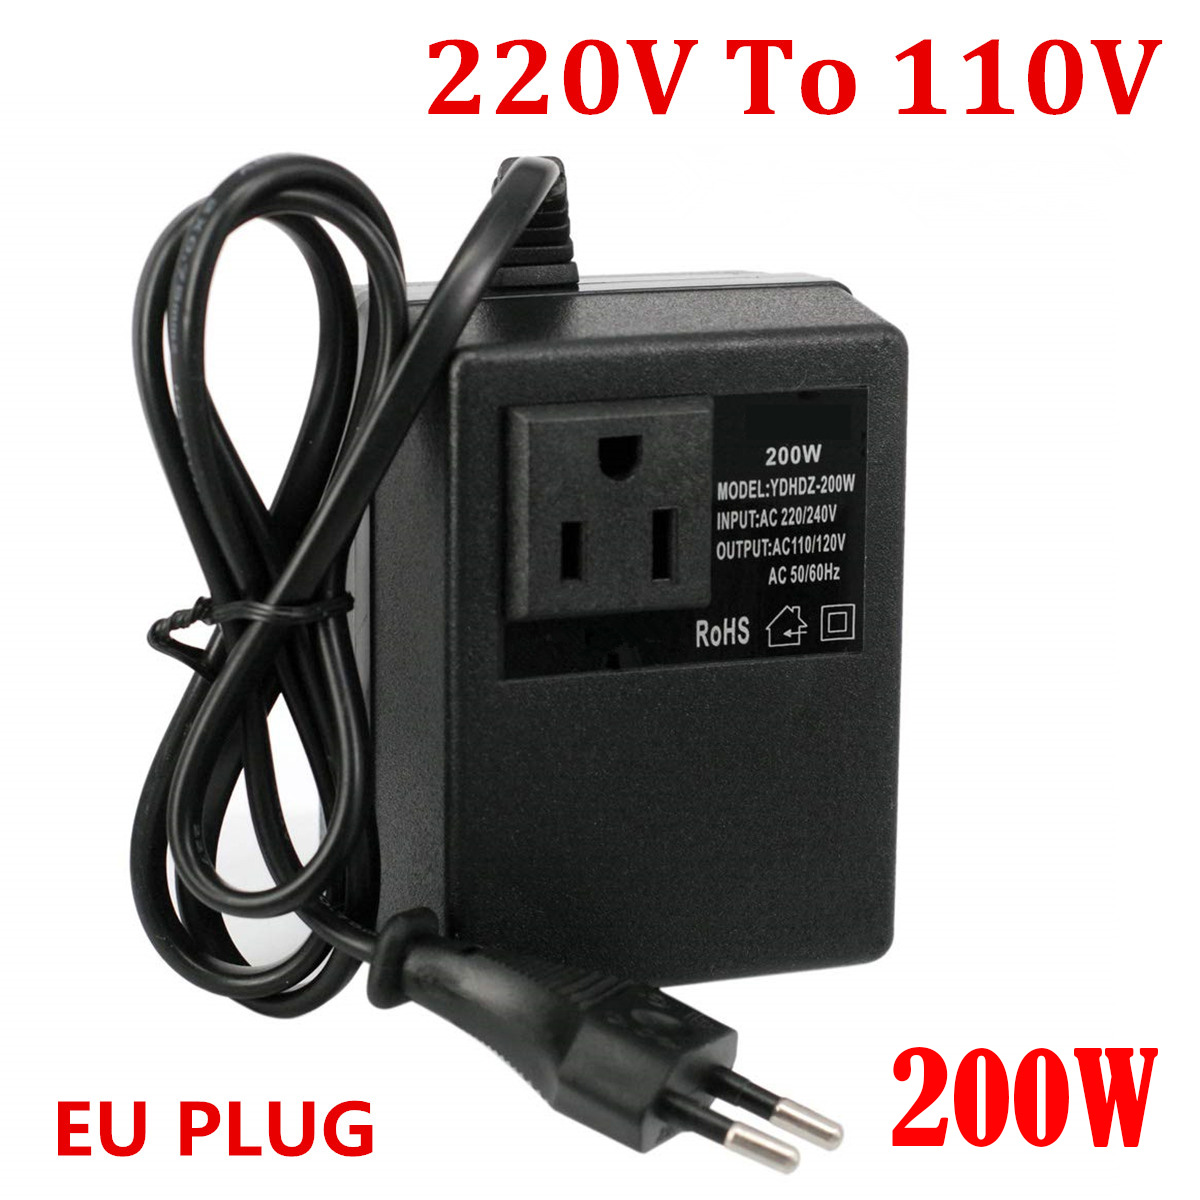 200 W convertisseur de tension transformateur 220 V à 110 V abaisseur voyage transformateur de tension convertisseur EU Plug